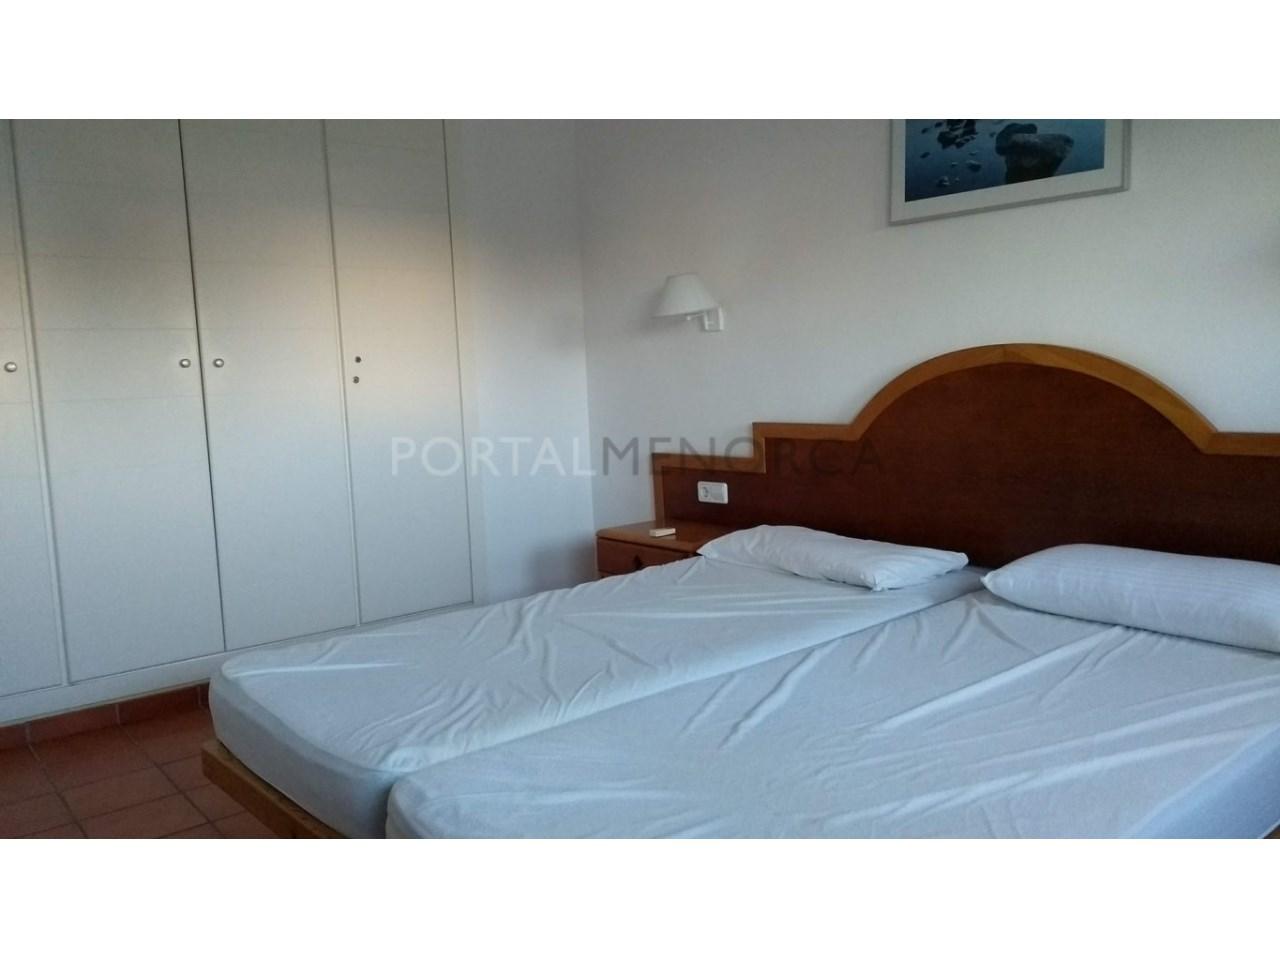 apartamento en venta en Son Xoriguer con piscina comunitaria dormitorio